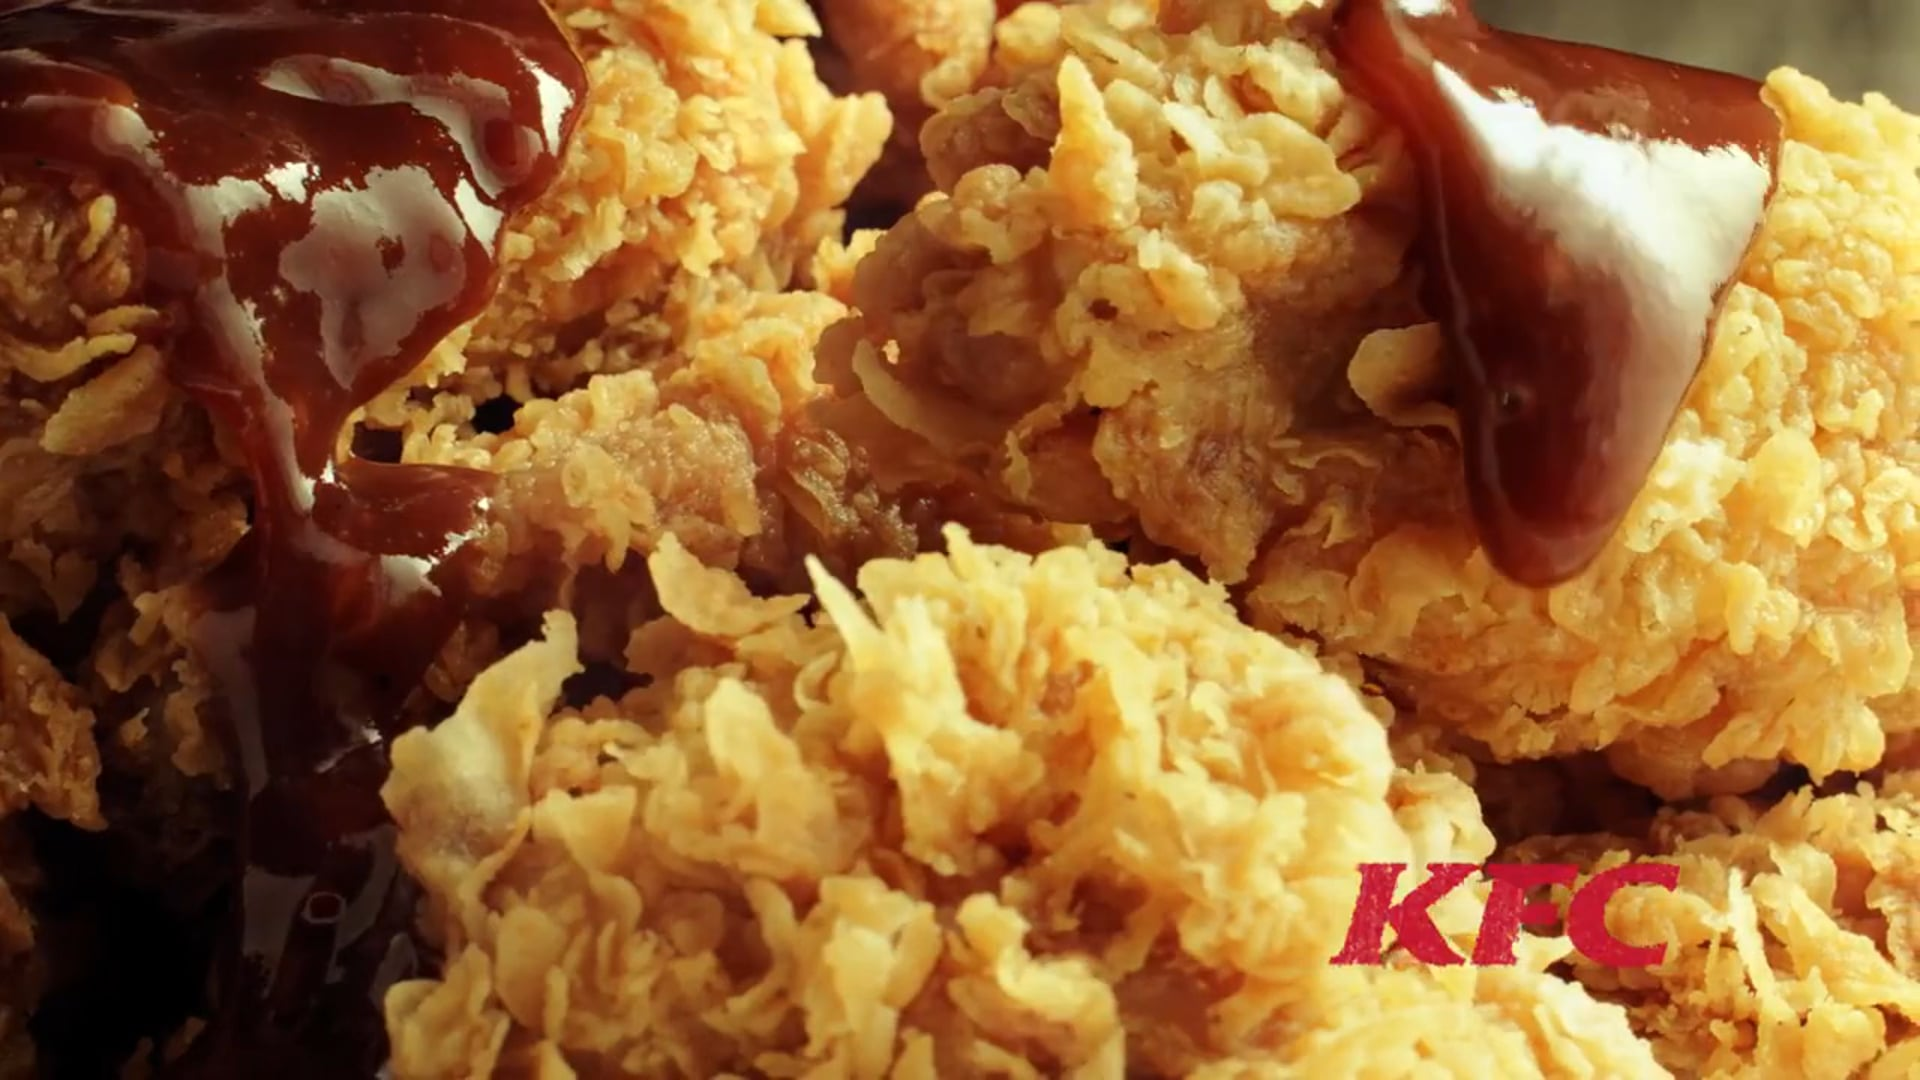 Karpick Avi- KFC Chicken Wings